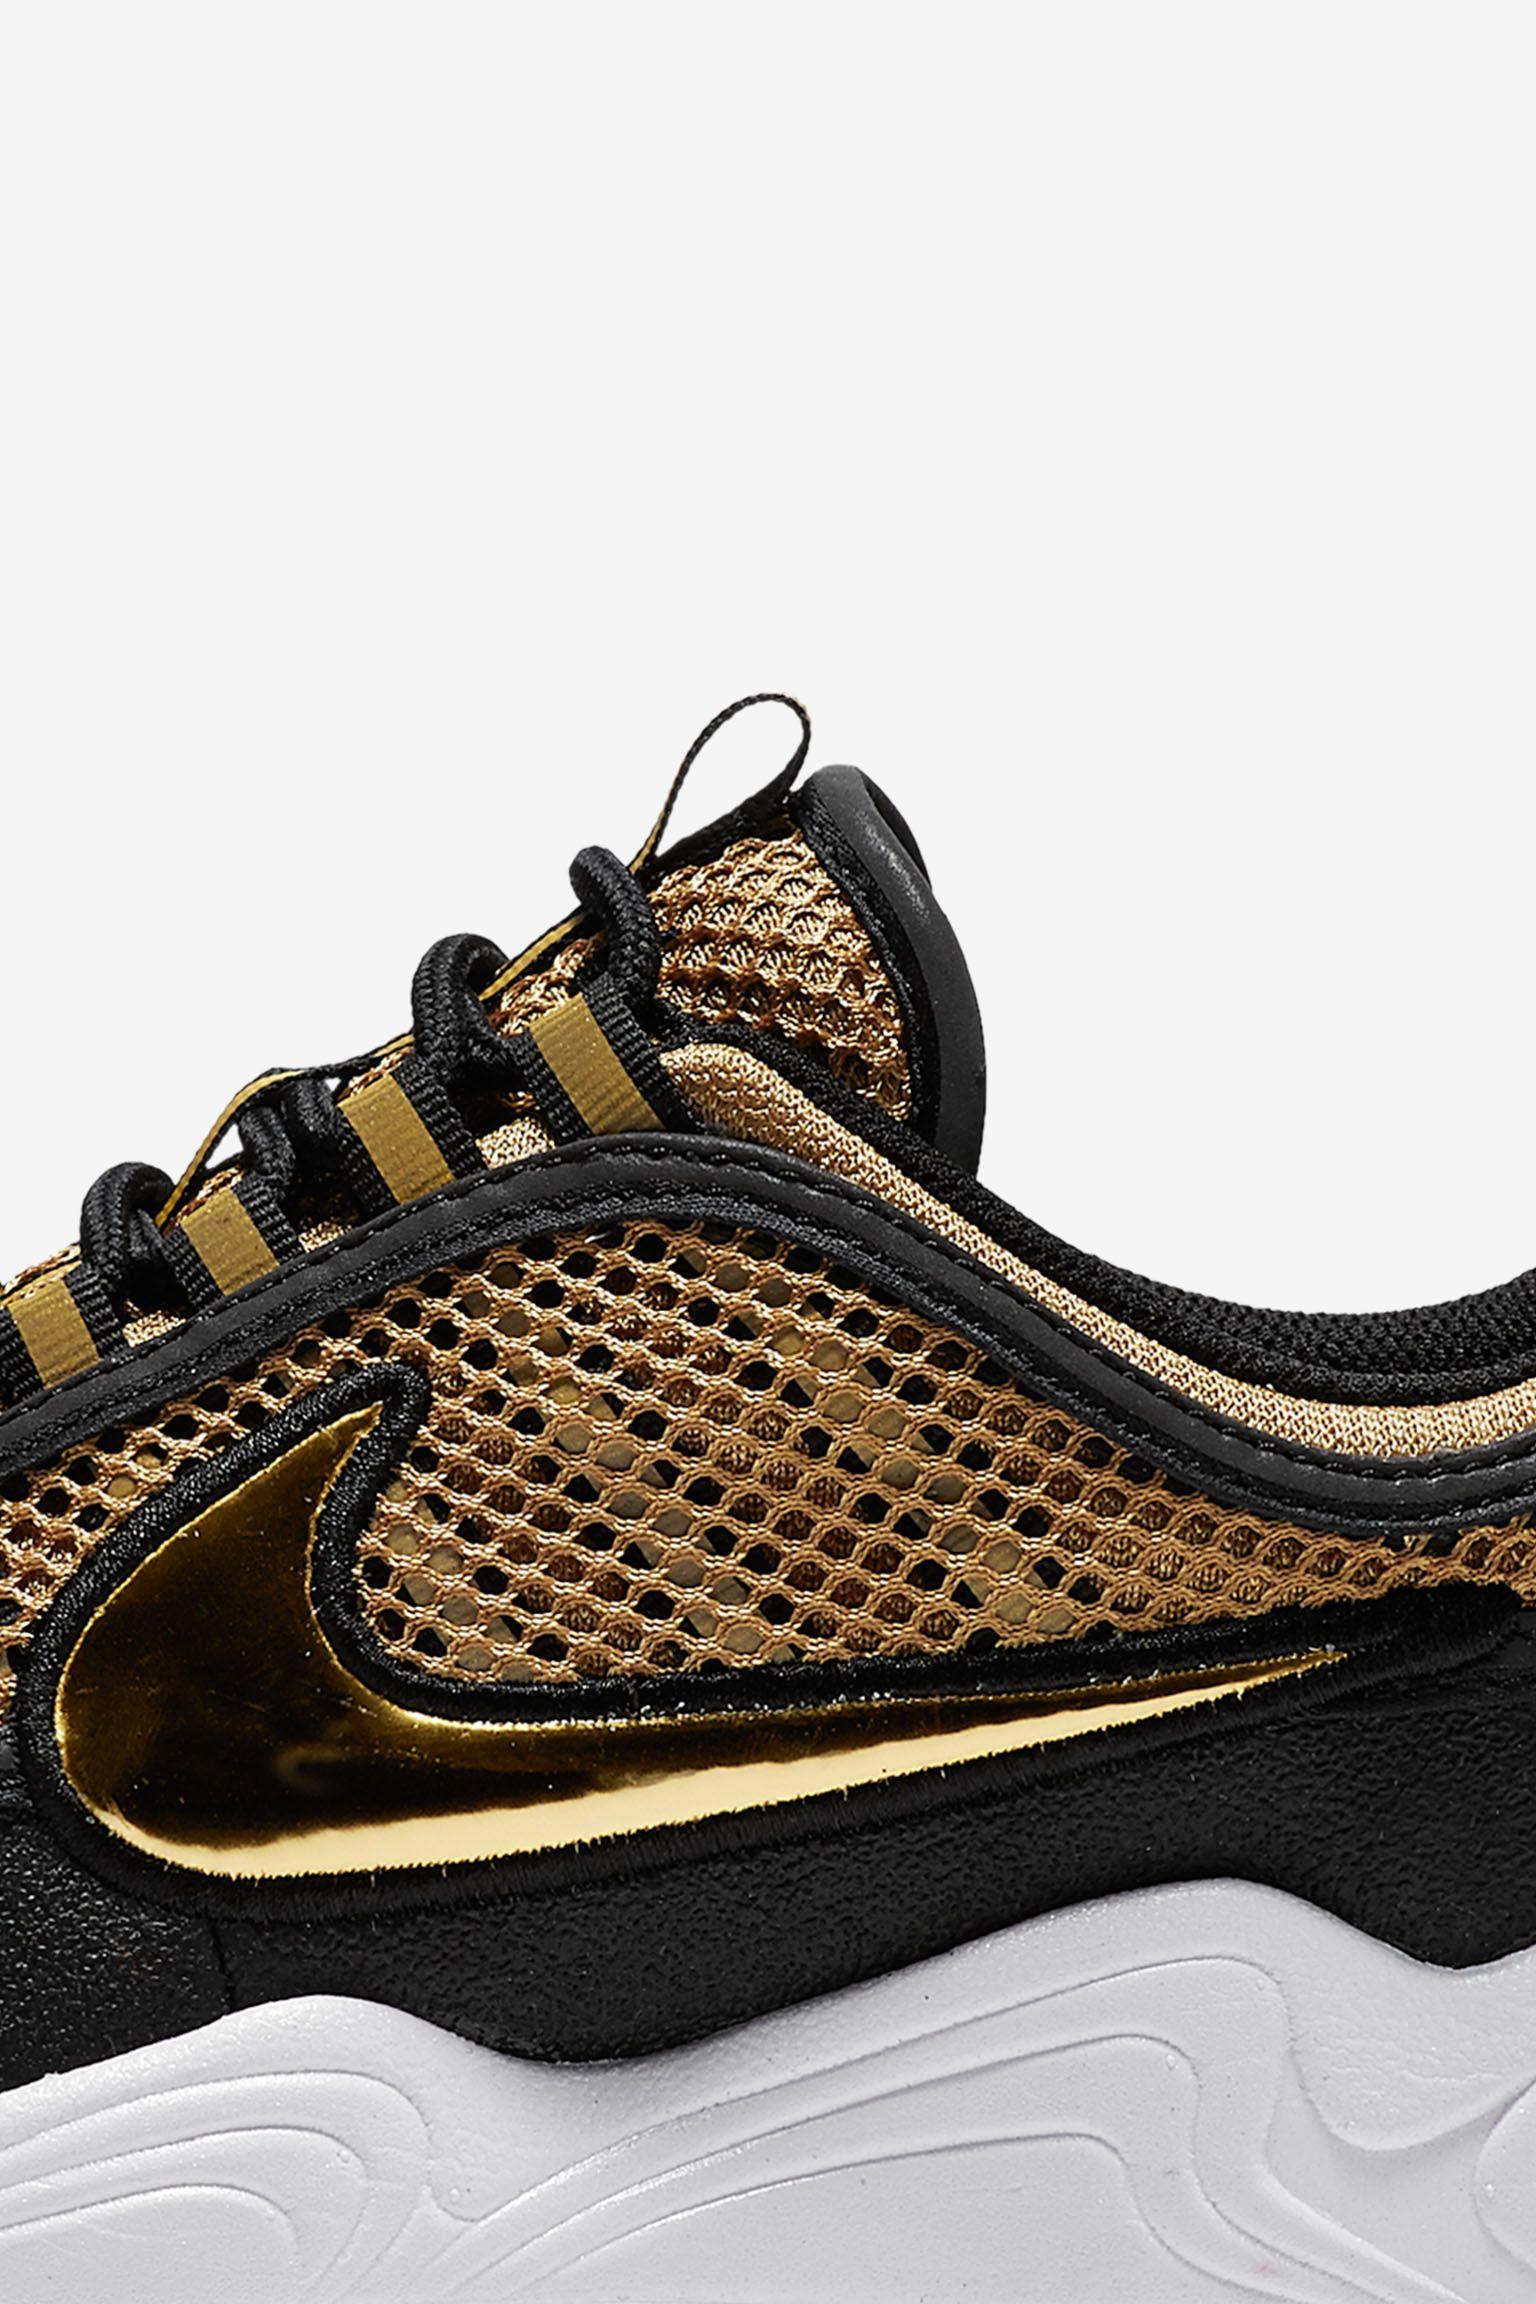 Nike Vapor Max Air Zoom Made In Vietnam  ef4e905092